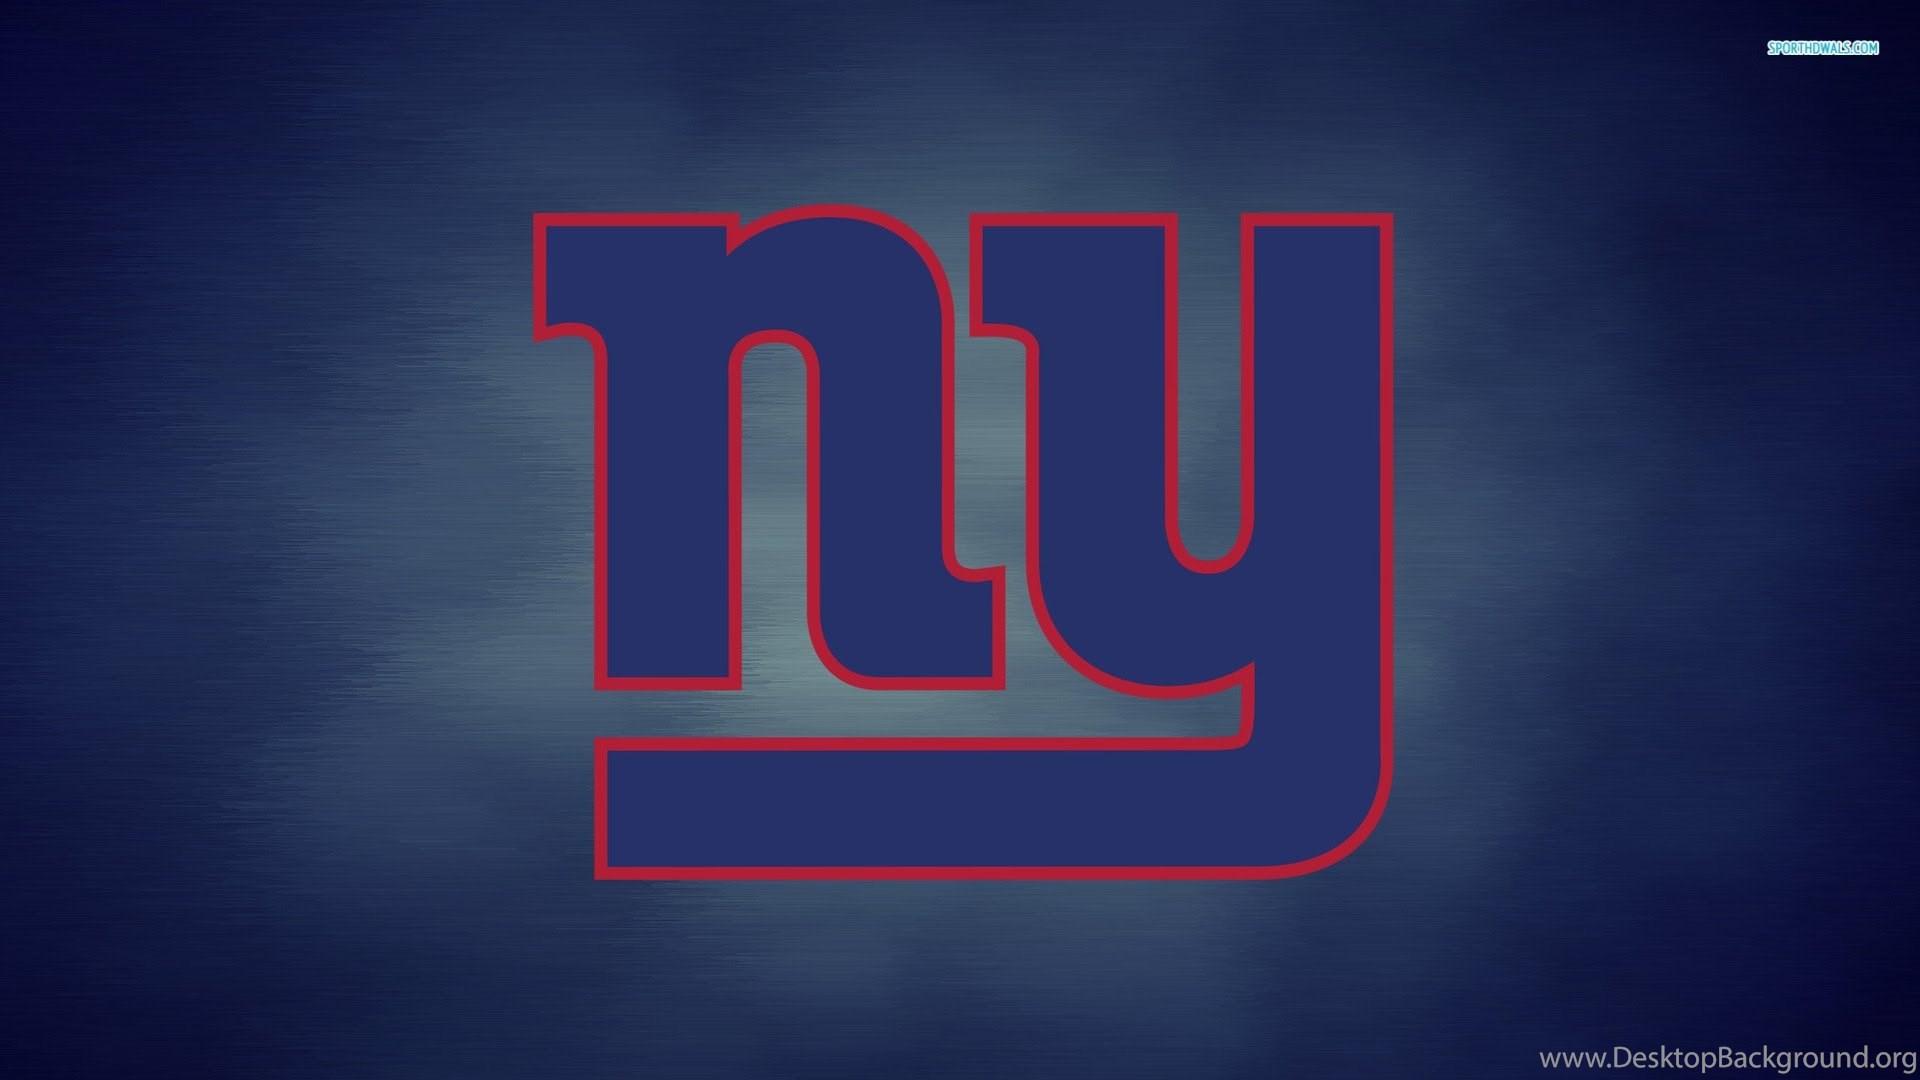 Madden NFL 15 New York Giants Playbook: Breakdown & Overview